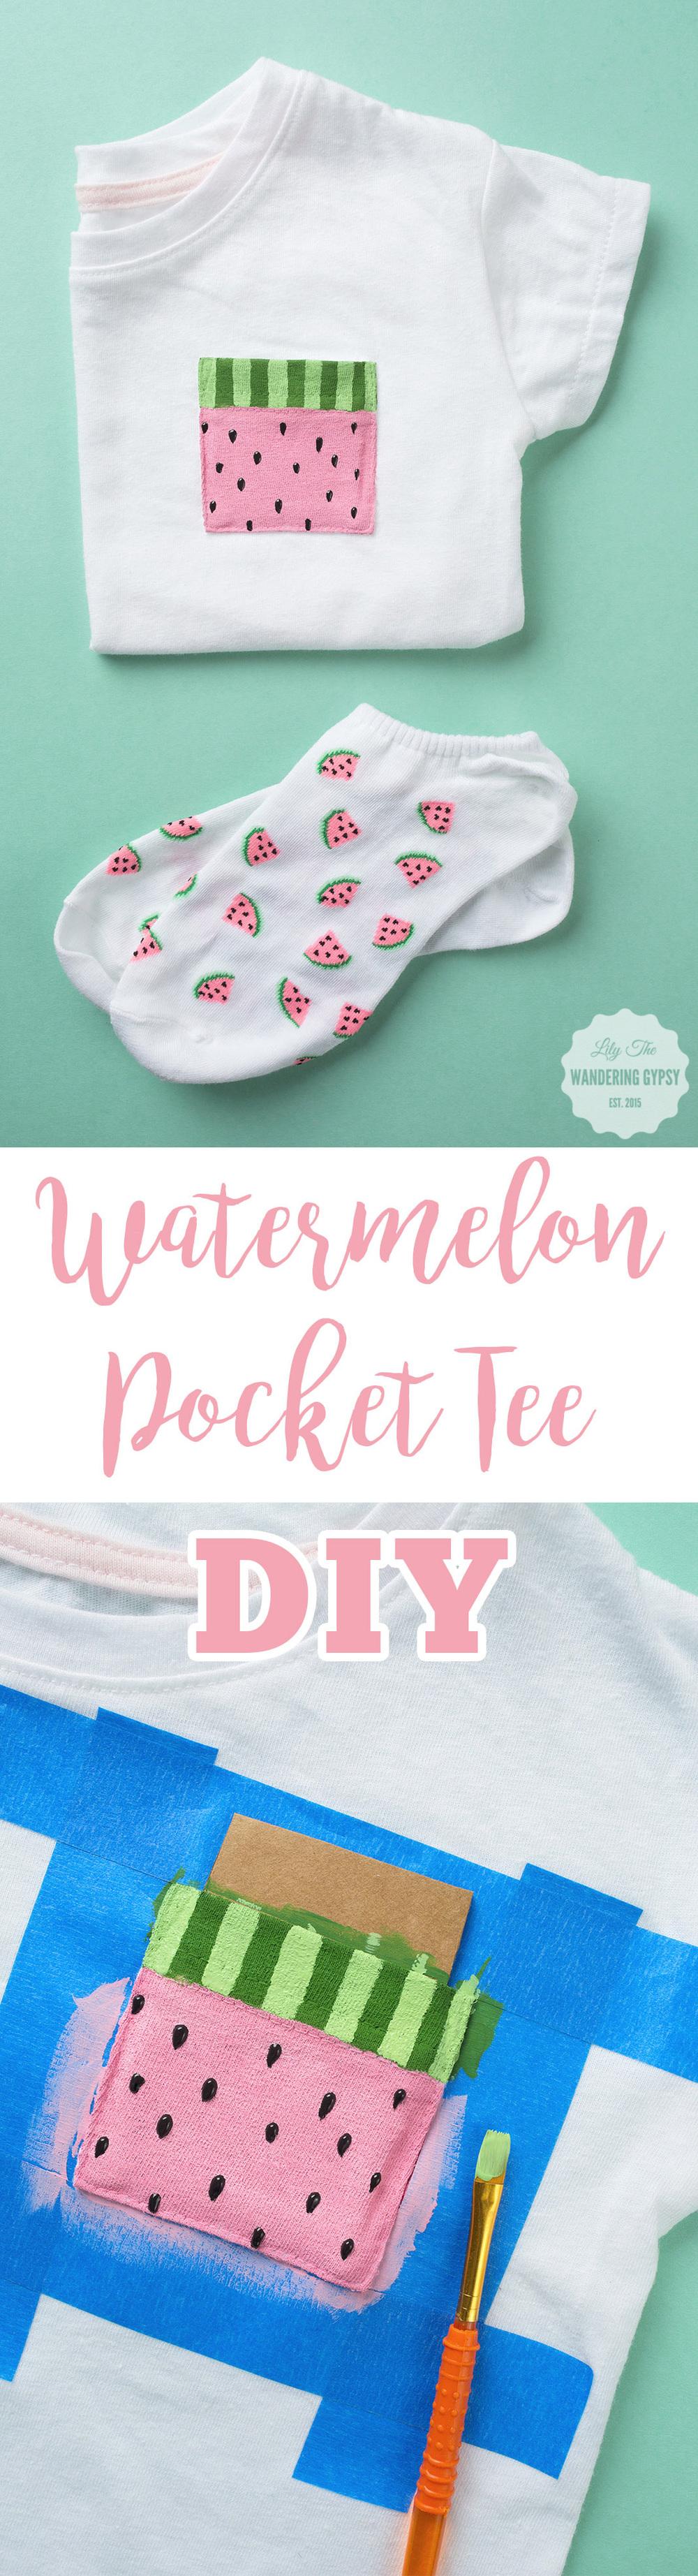 Cute DIY Idea! Watermelon Pocket Tee